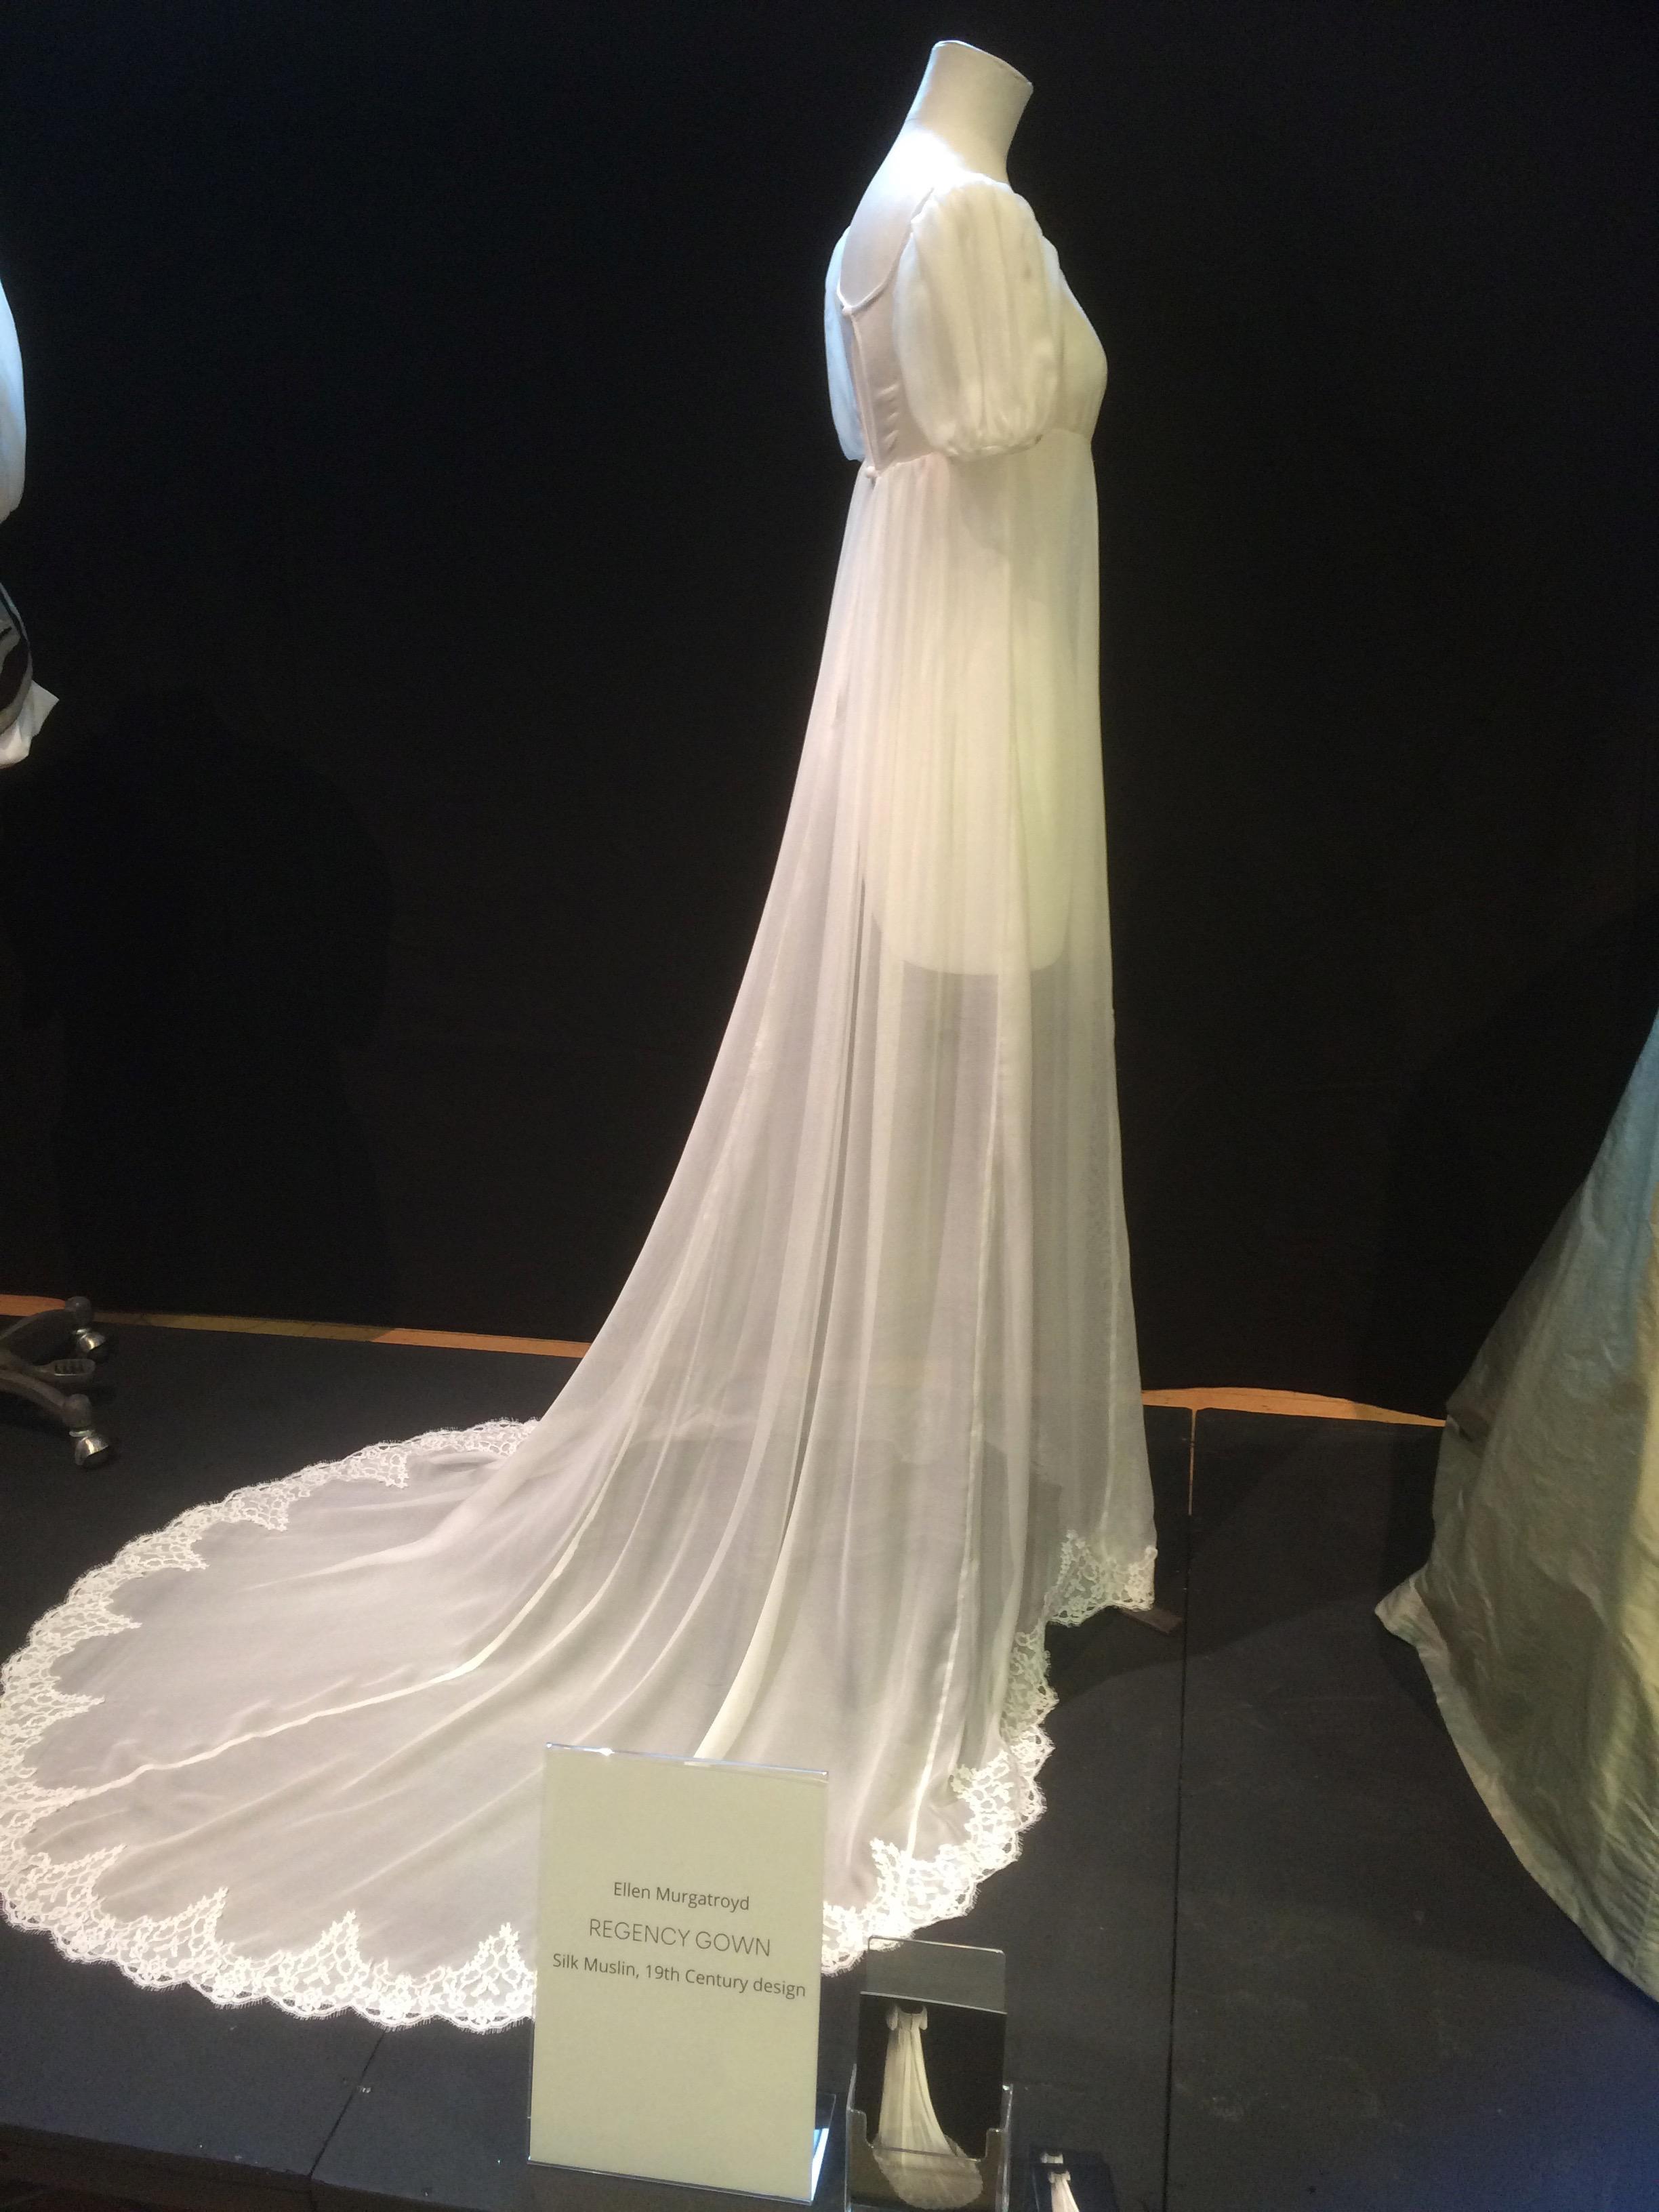 Ellen Murgatroyd Empire line silk dress